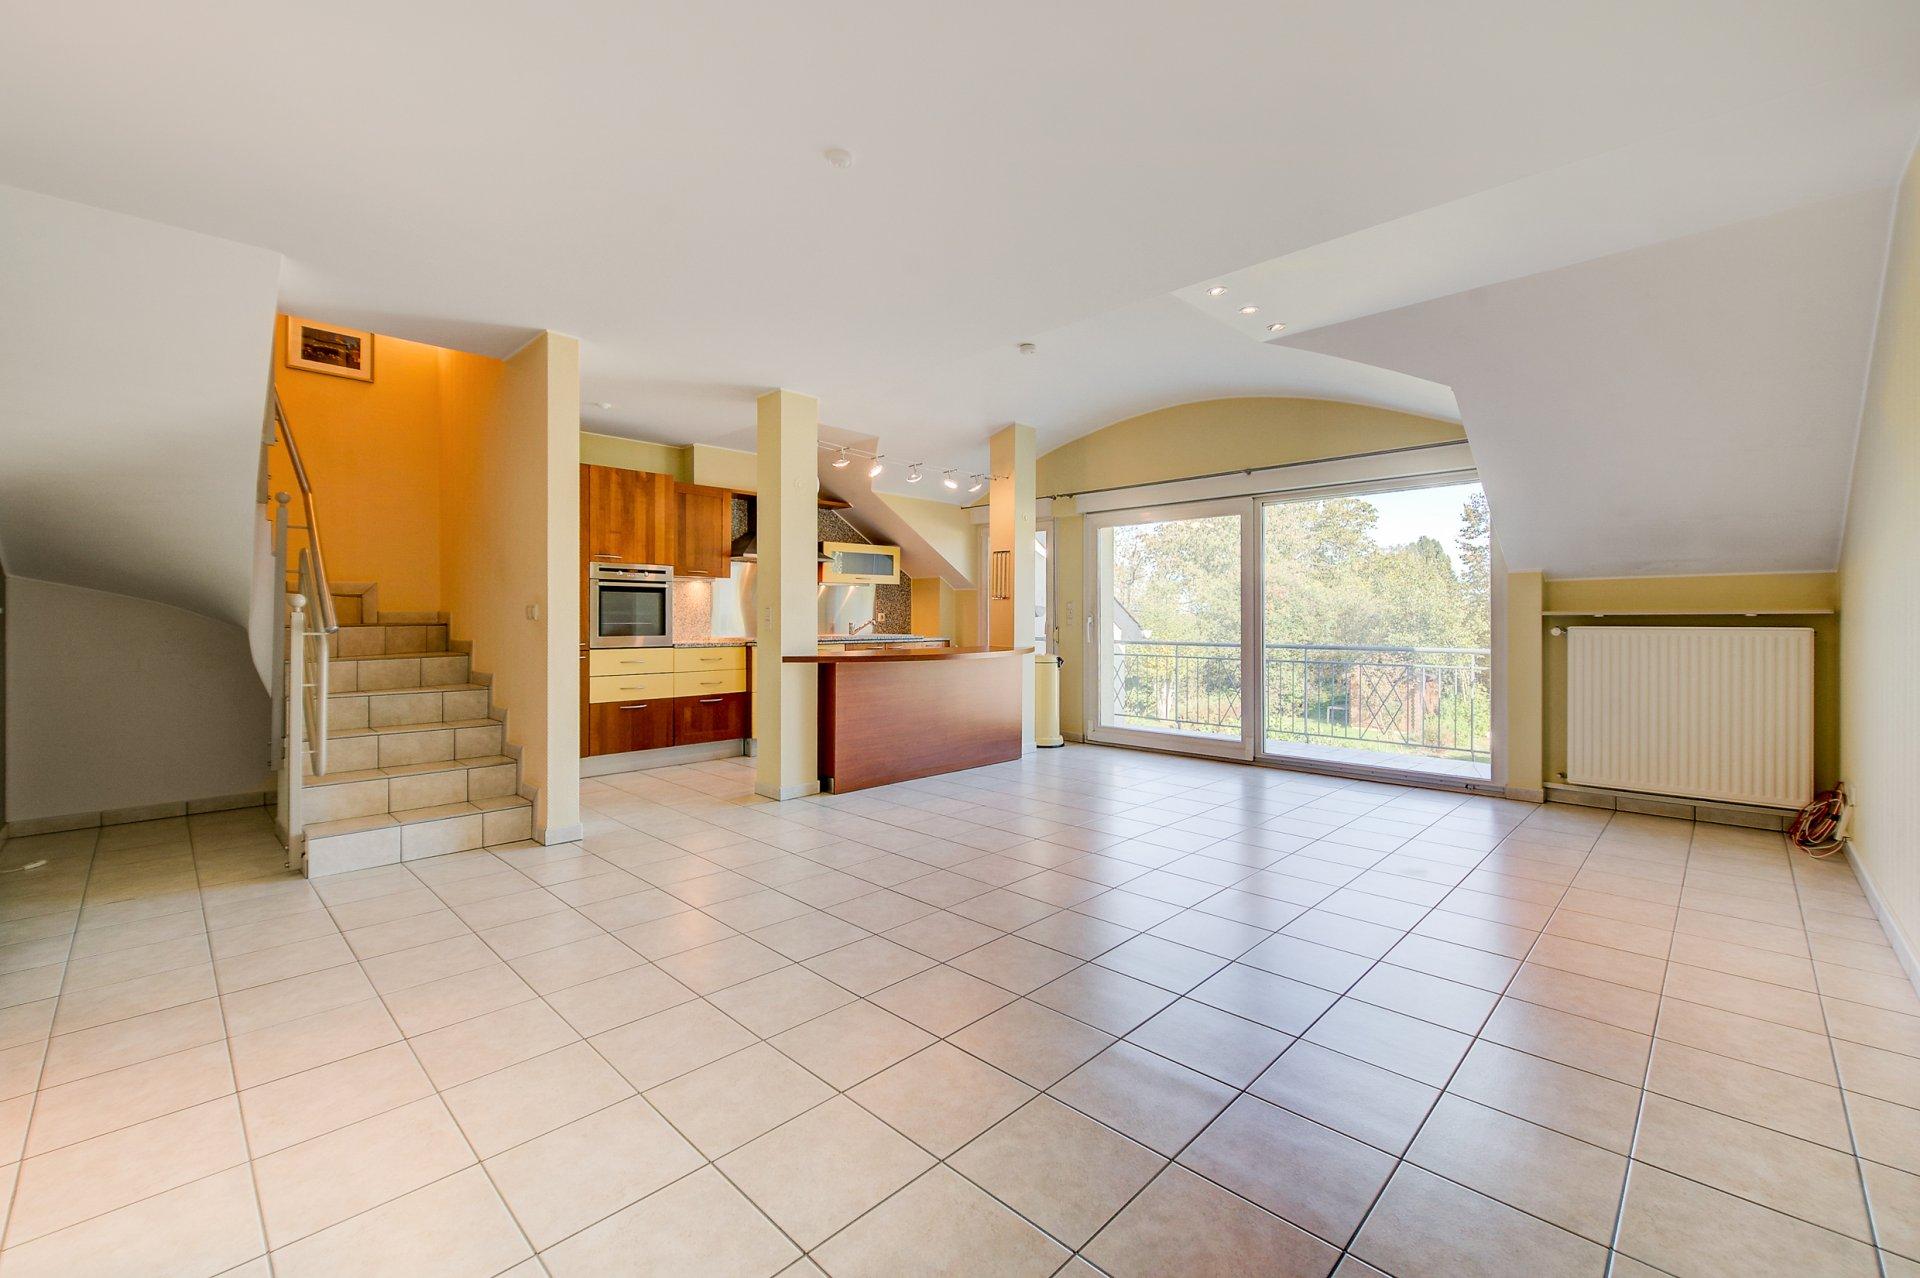 Appartement à vendre - Leudelange